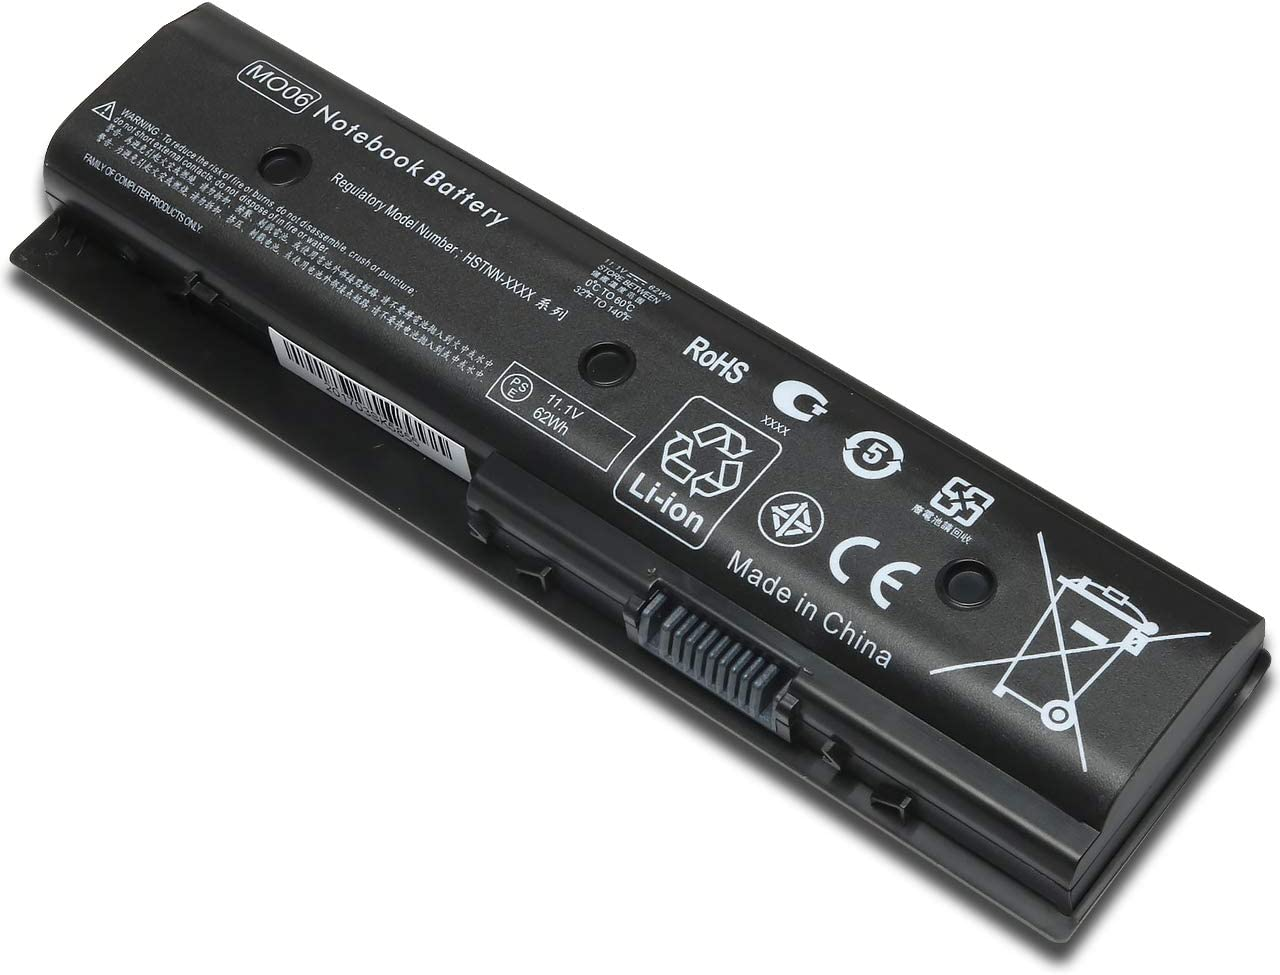 MO06 MO09 671731-001 Laptop Battery for HP Pavilion DV4-5000 DV6-7000 DV7-7000 DV7T-7000 671567-421 671567-831 672412-001 HSTNN-LB3P HSTNN-LB3N HSTNN-YB3N HP Envy M6-1045DX M6-1035DX M6-1125DX